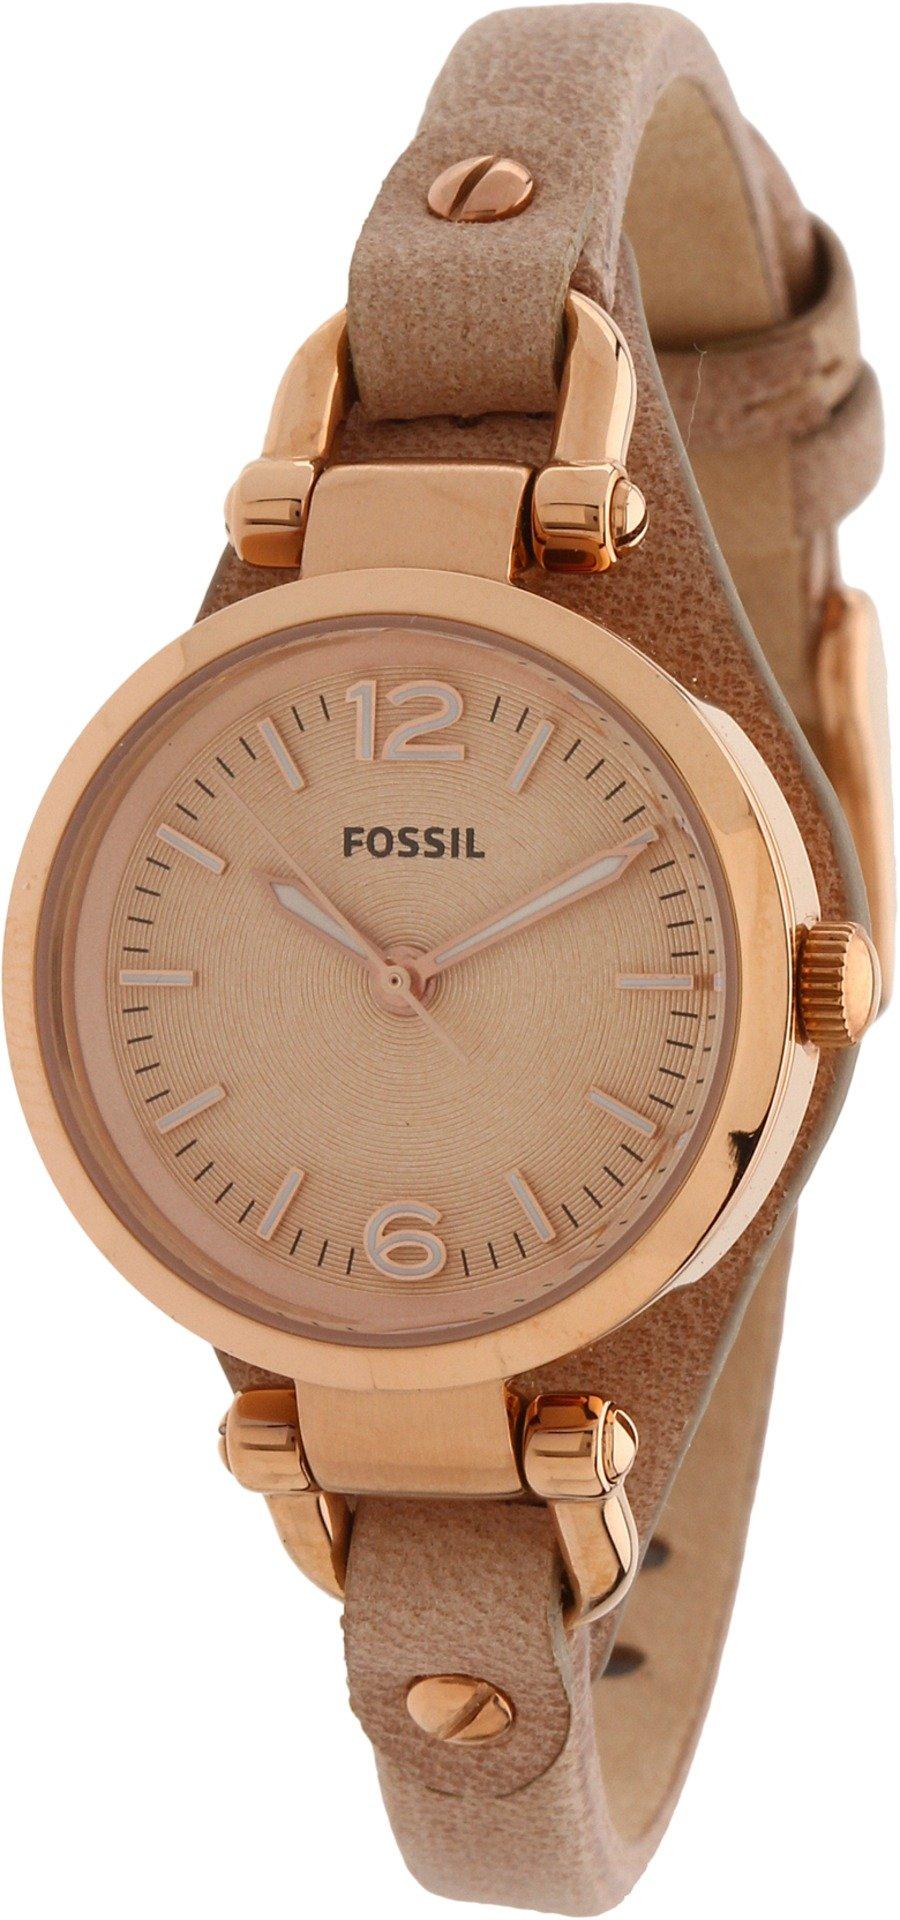 Fossil Women's ES3262 Georgia Mini Three Hand Leather Watch - Sand